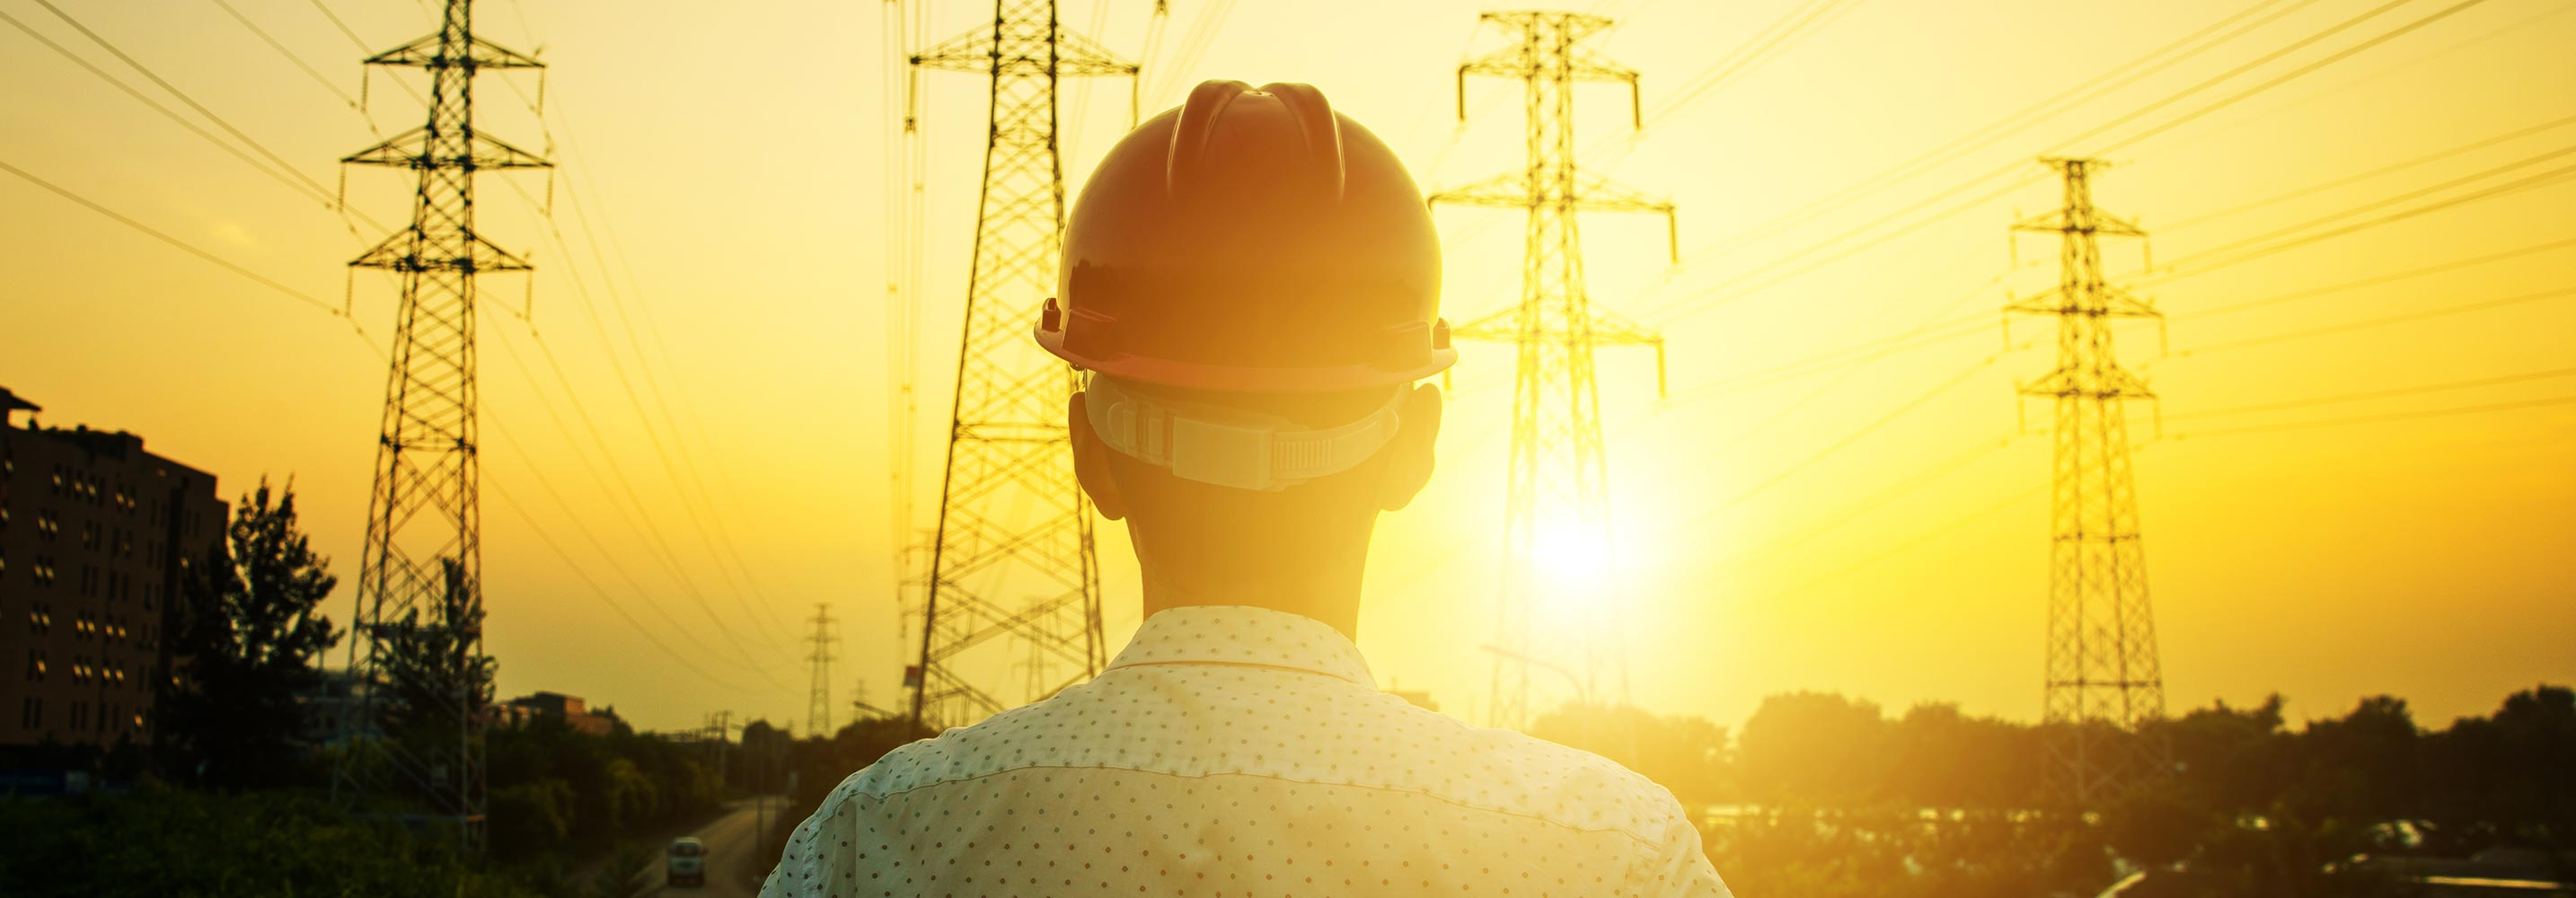 Careers - East Point Energy | Renewable Energy and Energy ...